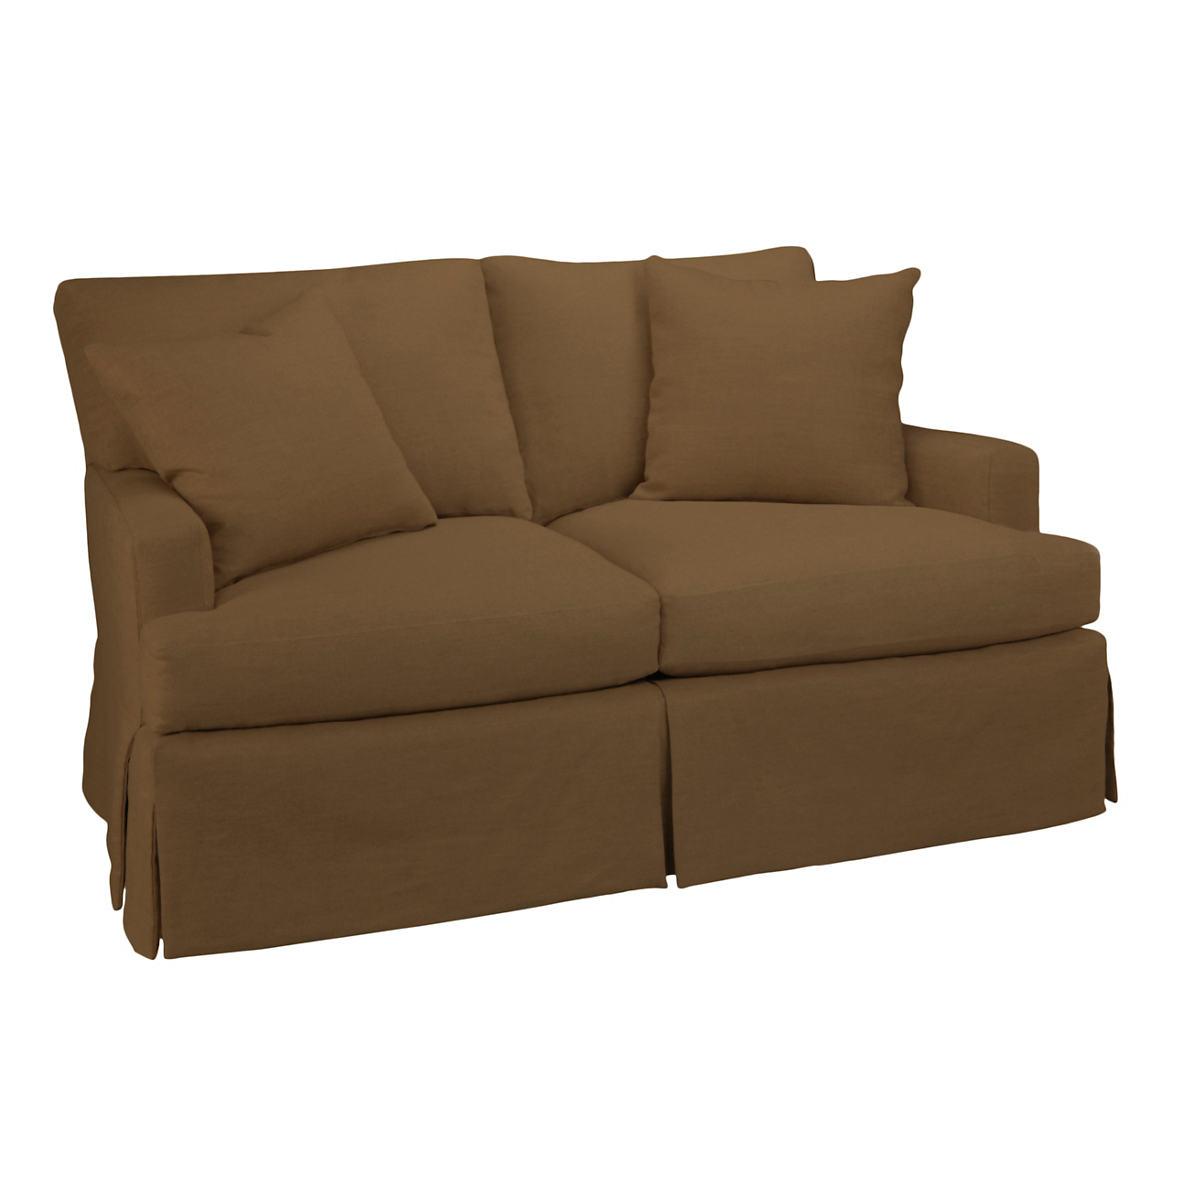 Velvesuede Camel Saybrook 2 Seater Sofa